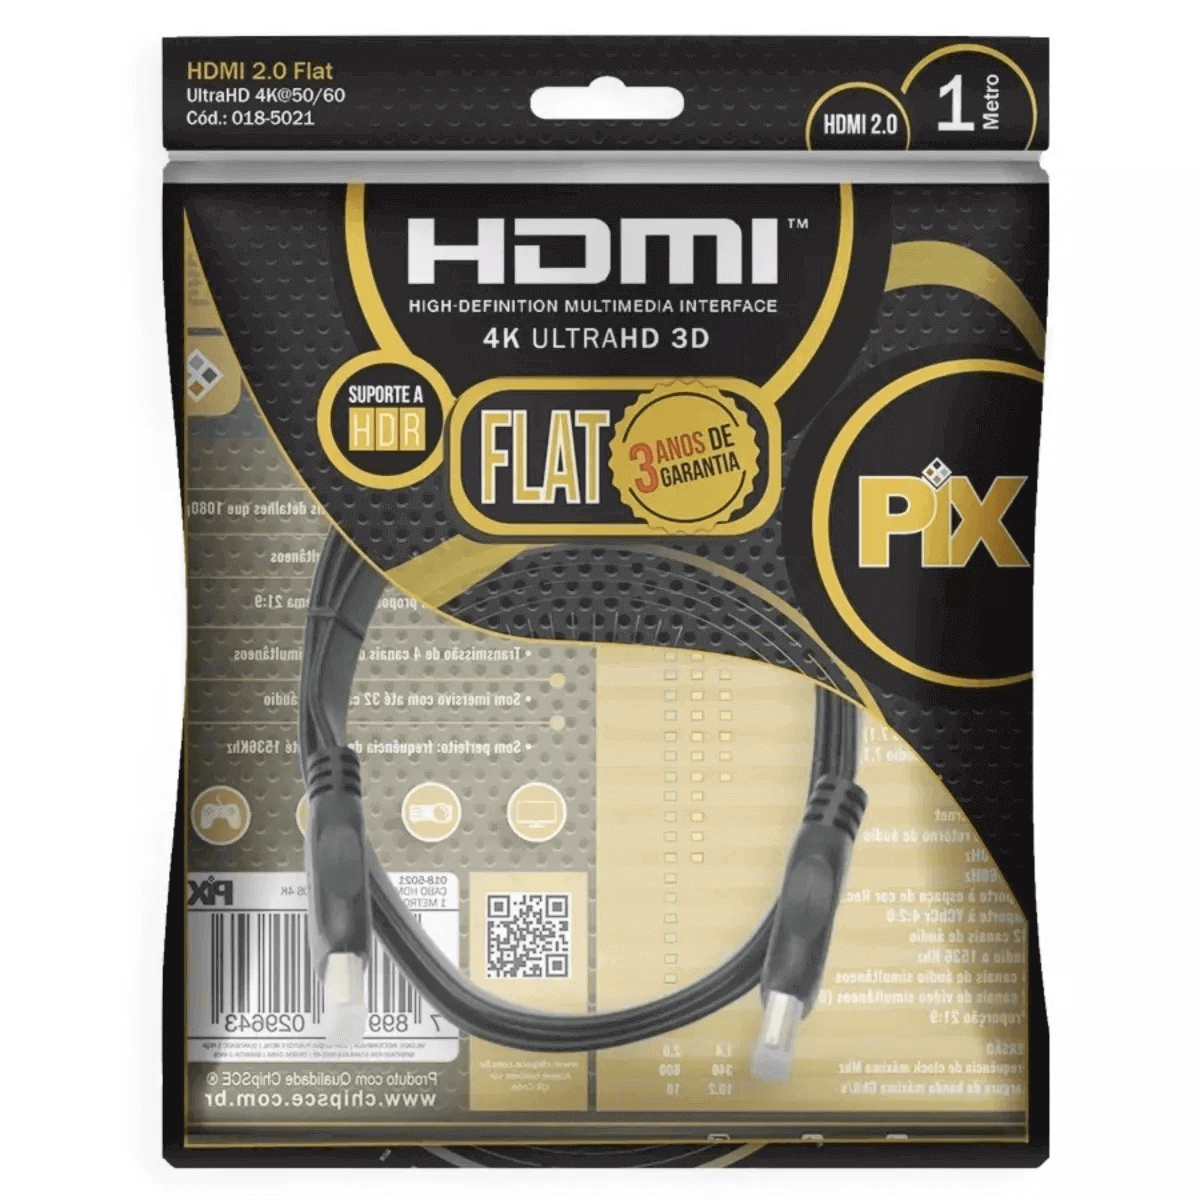 Kit 3 Cabo Hdmi Flat 2.0 Pix 19 Pinos 4k Ultrahd 3d Hdr 1 M